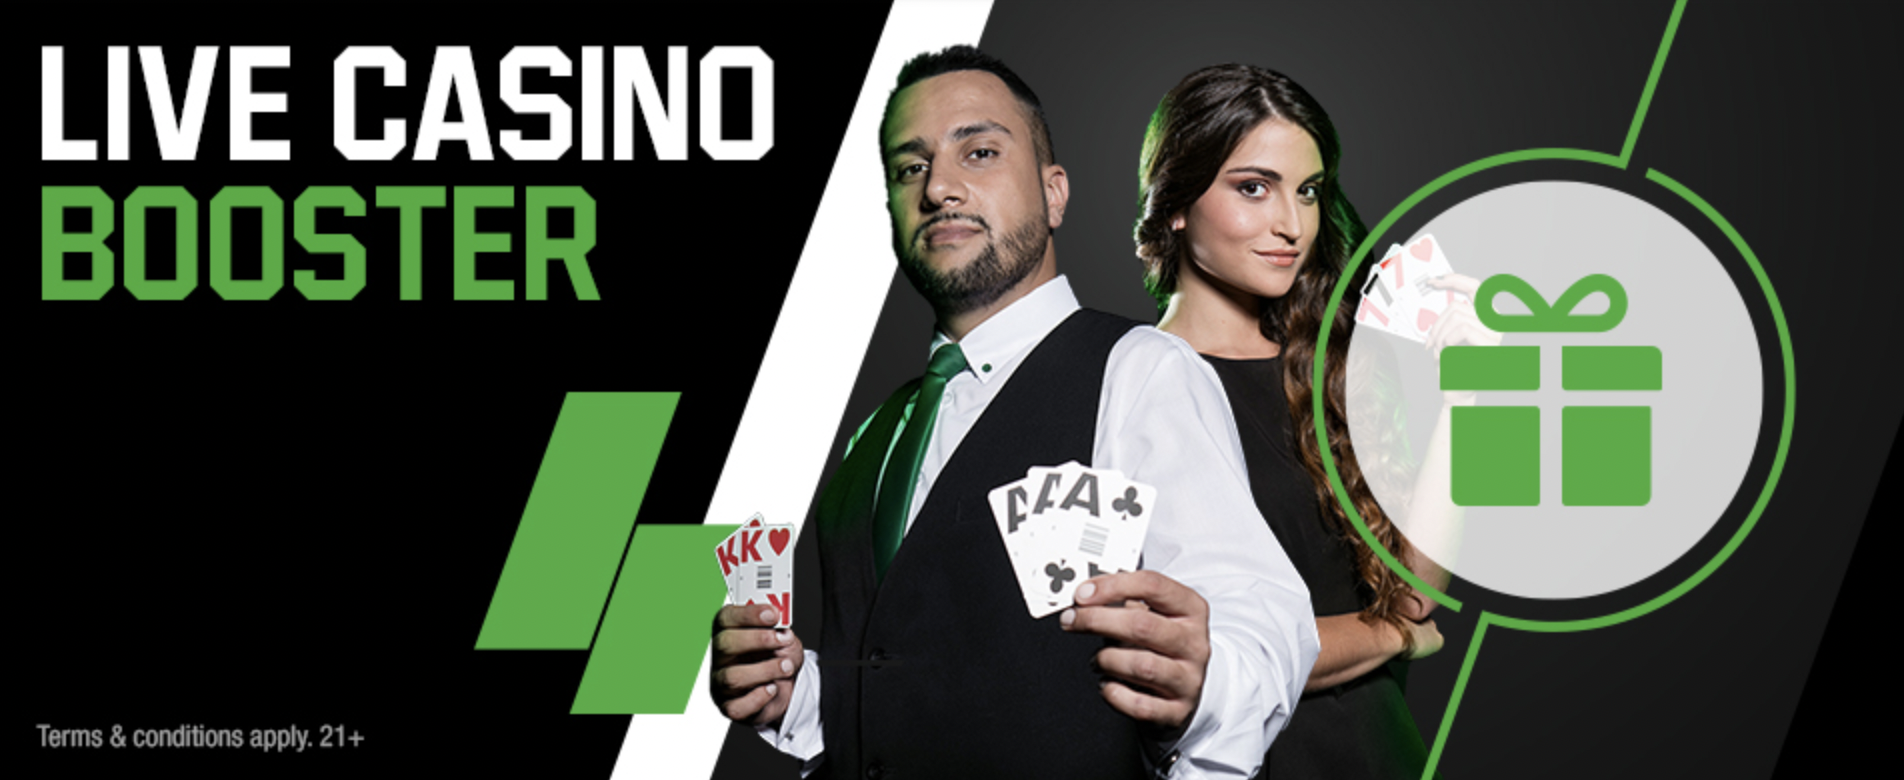 Unibet Online Casino - Live Casino Booster